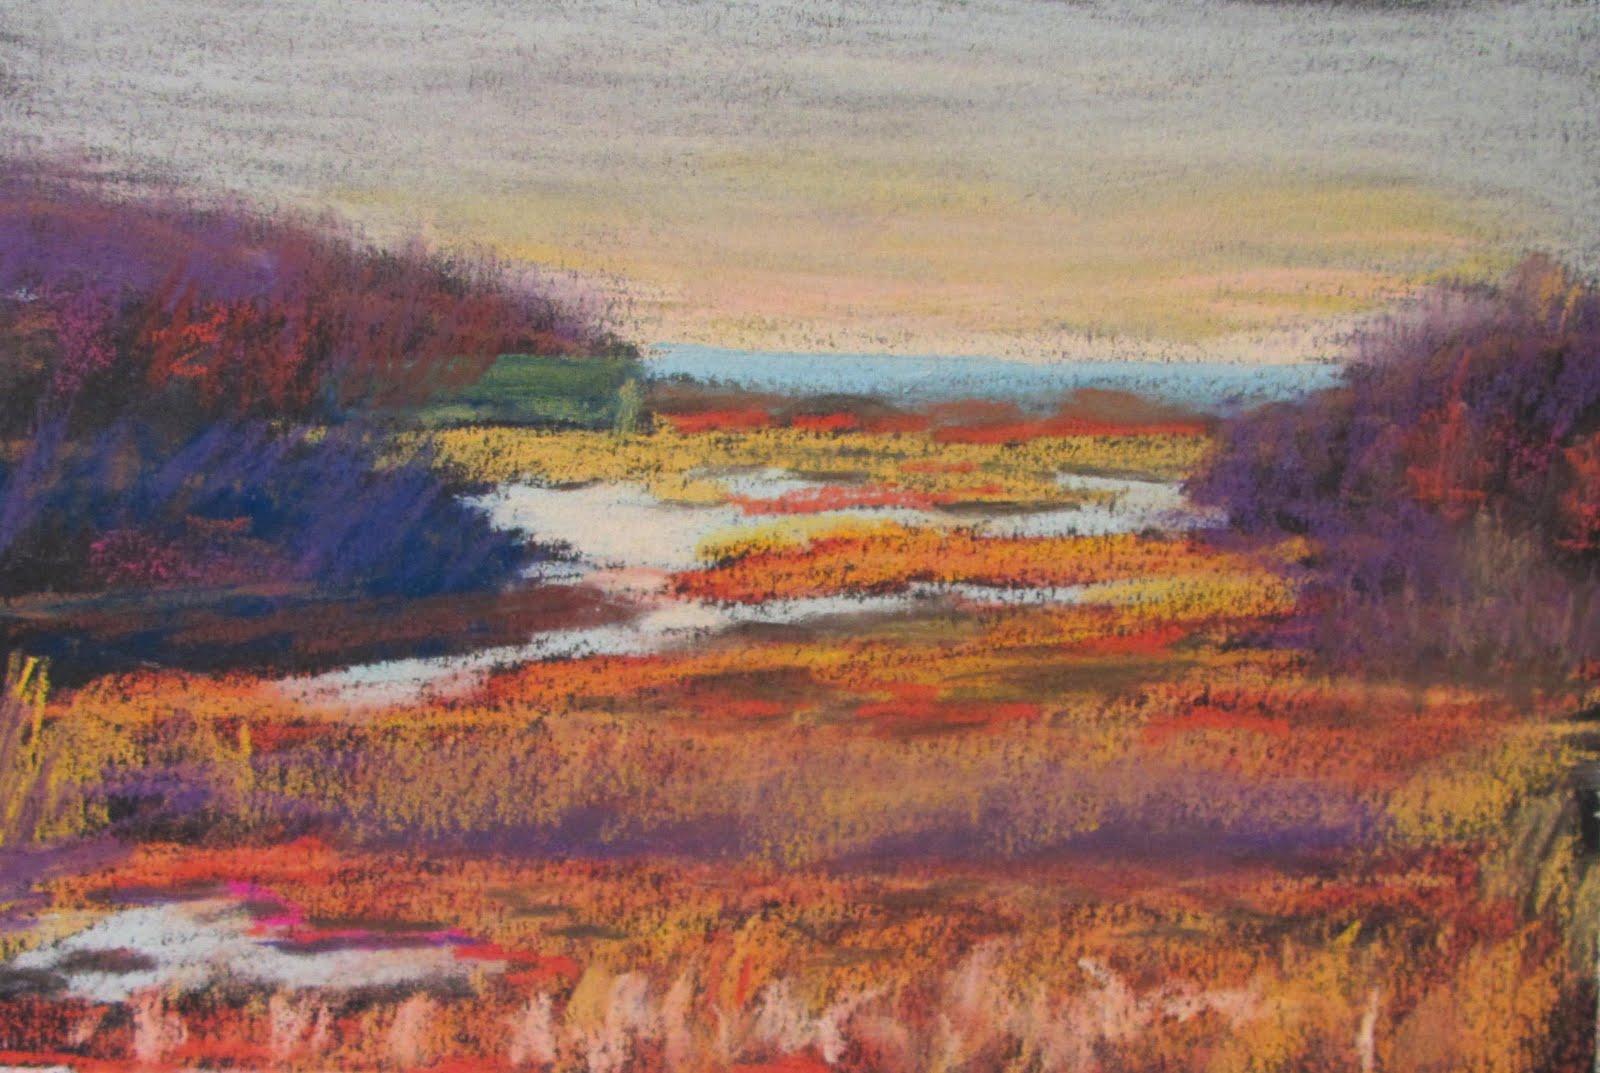 http://1.bp.blogspot.com/-S_oDKlk9rC0/TauD5Xjg7WI/AAAAAAAAAa0/QZl-3GtpzO0/s1600/Little+Sipp+Marsh+pastel.jpg